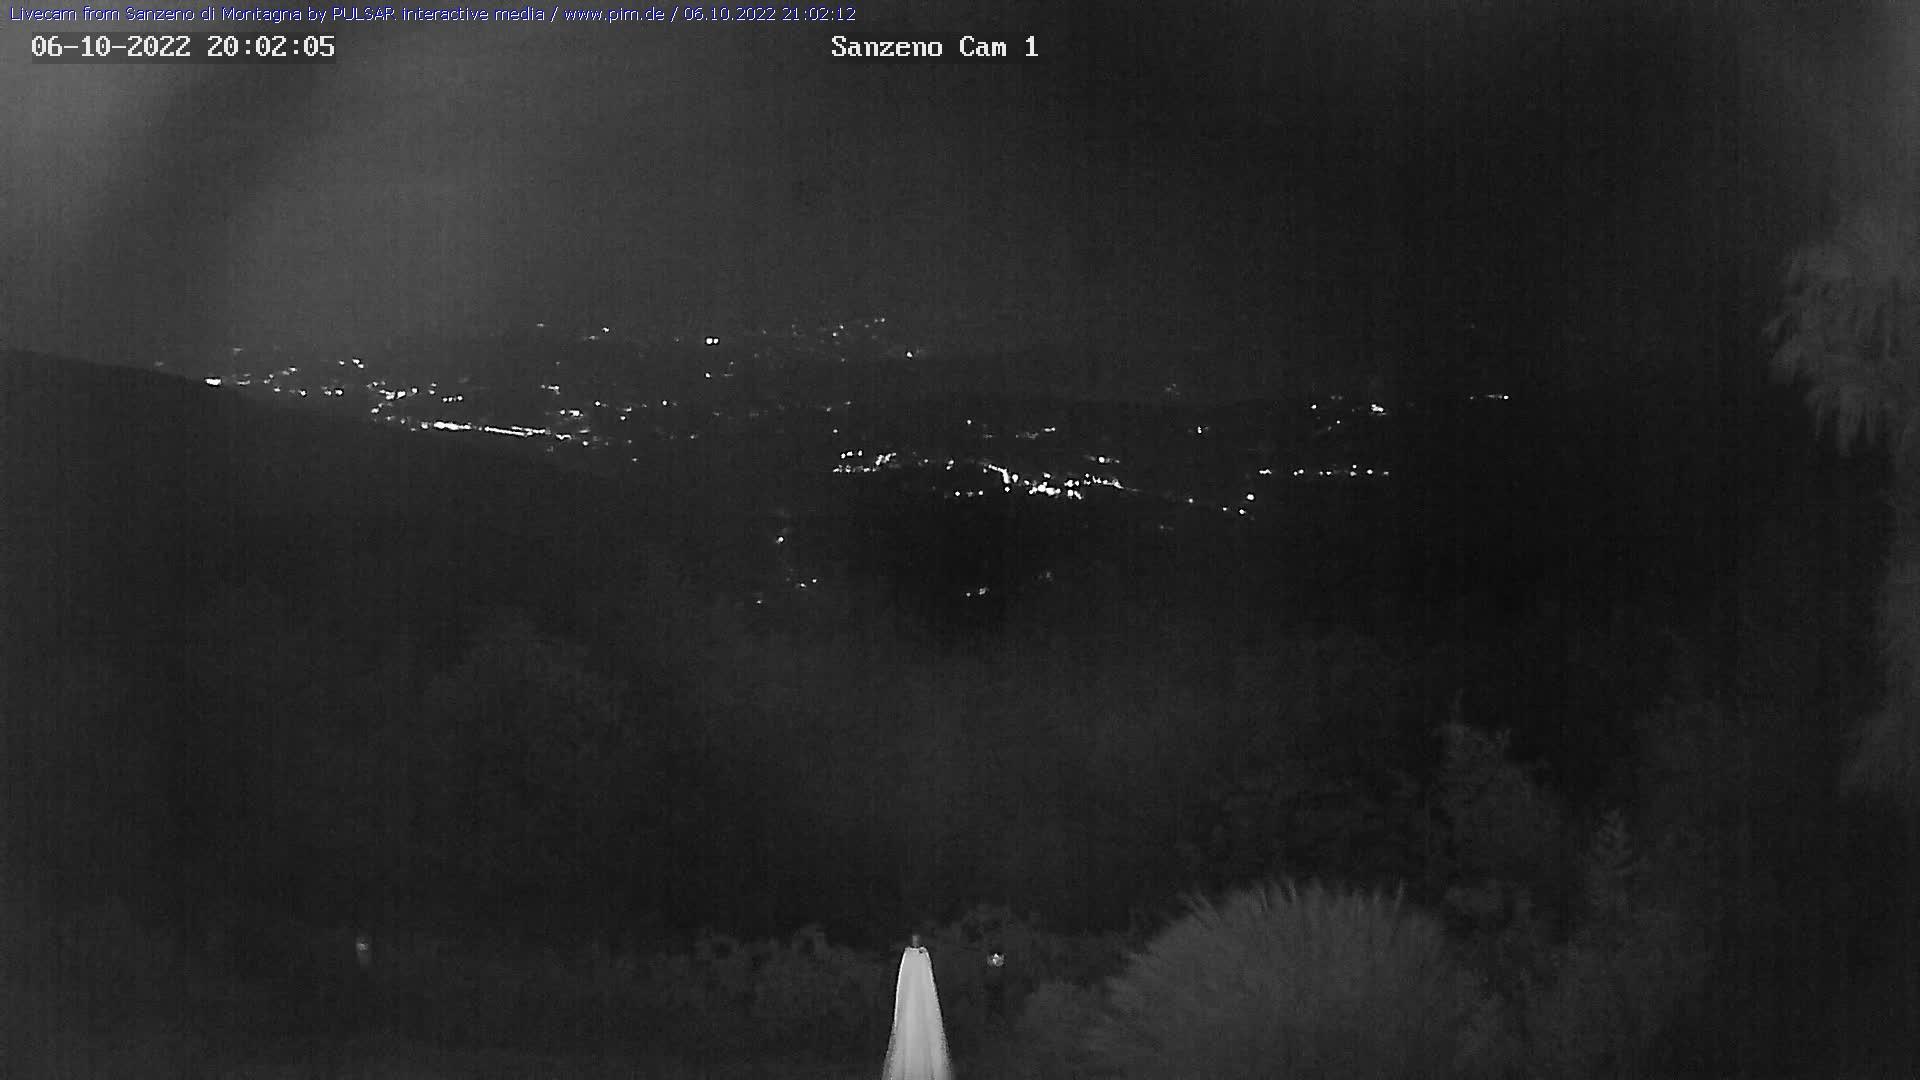 San Zeno di Montagna